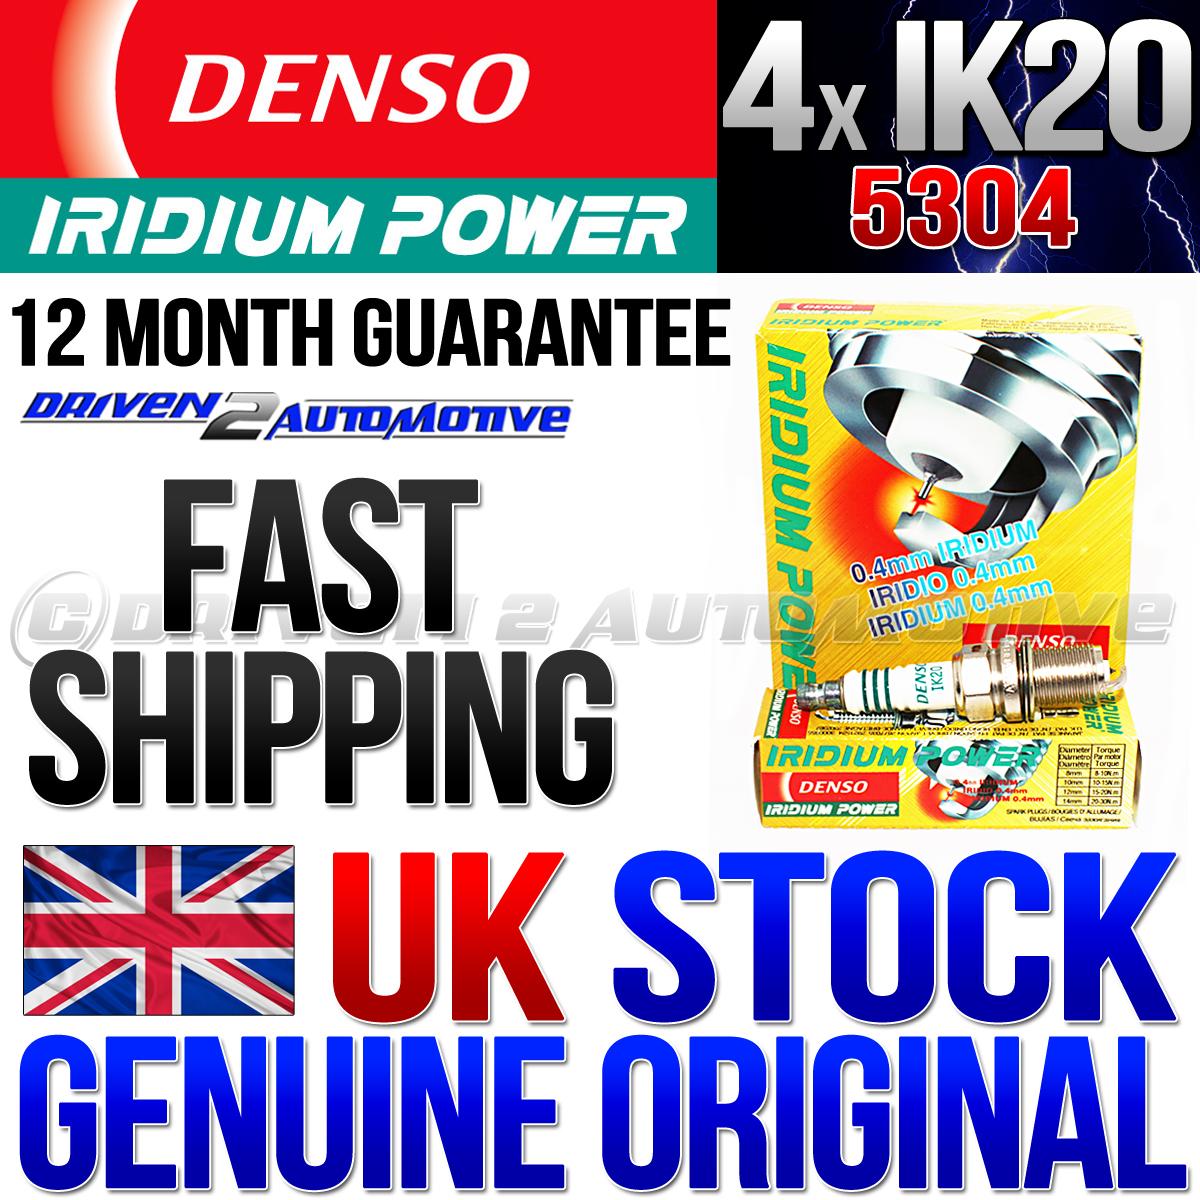 4x-DENSO-IK20-IRIDIUM-POWER-3764-SPARK-PLUGS-1998-Mitsubishi-Montero-Sport-XLS